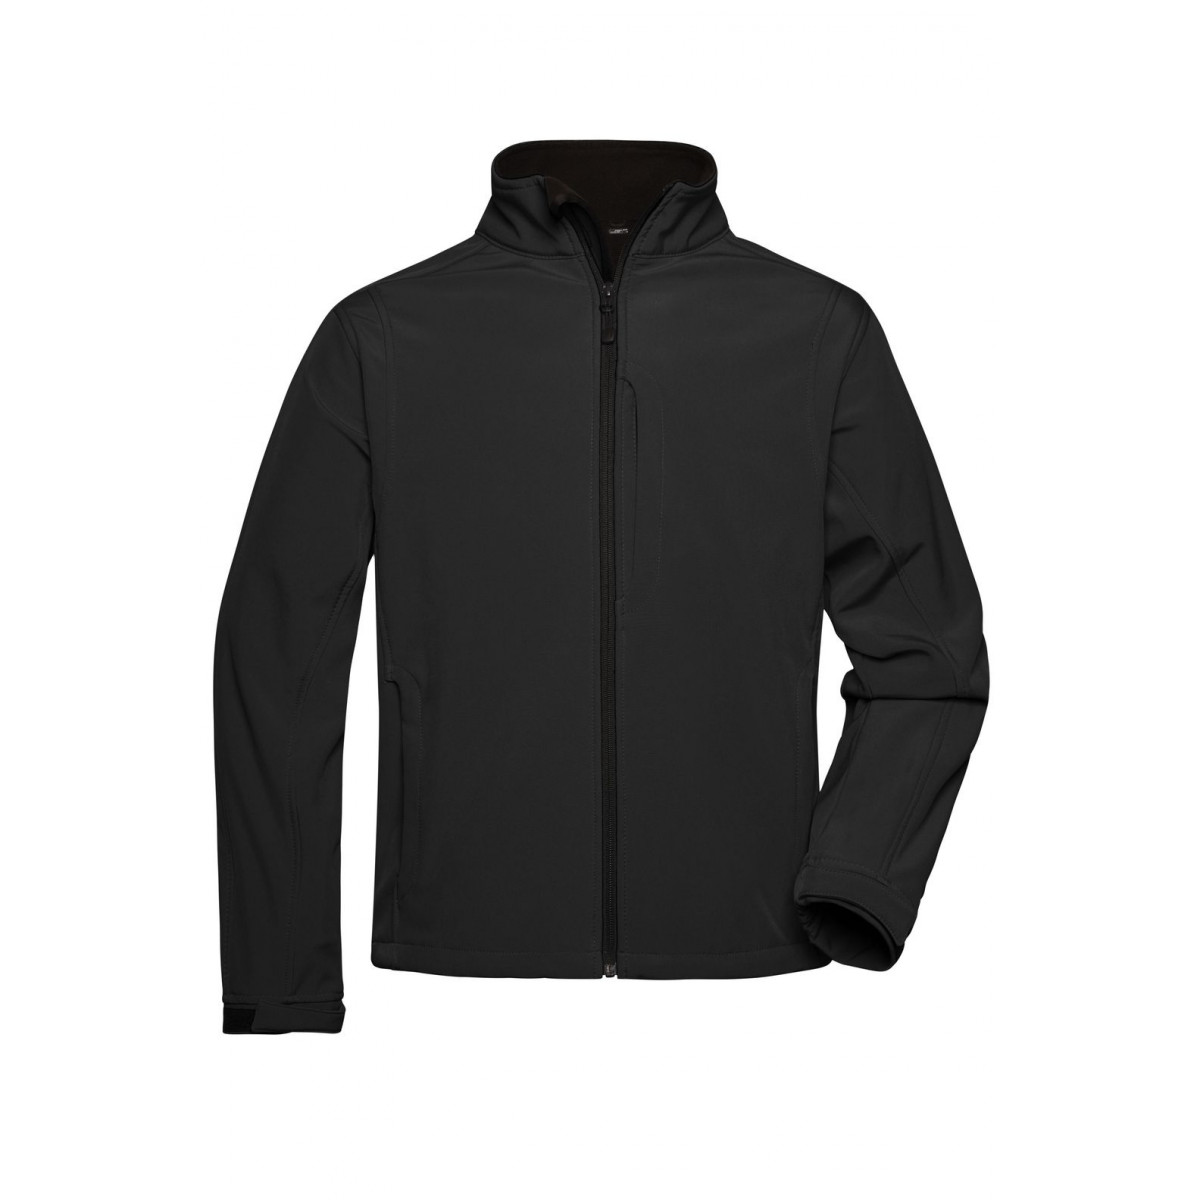 Куртка мужская JN135 Mens Softshell Jacket - Черный